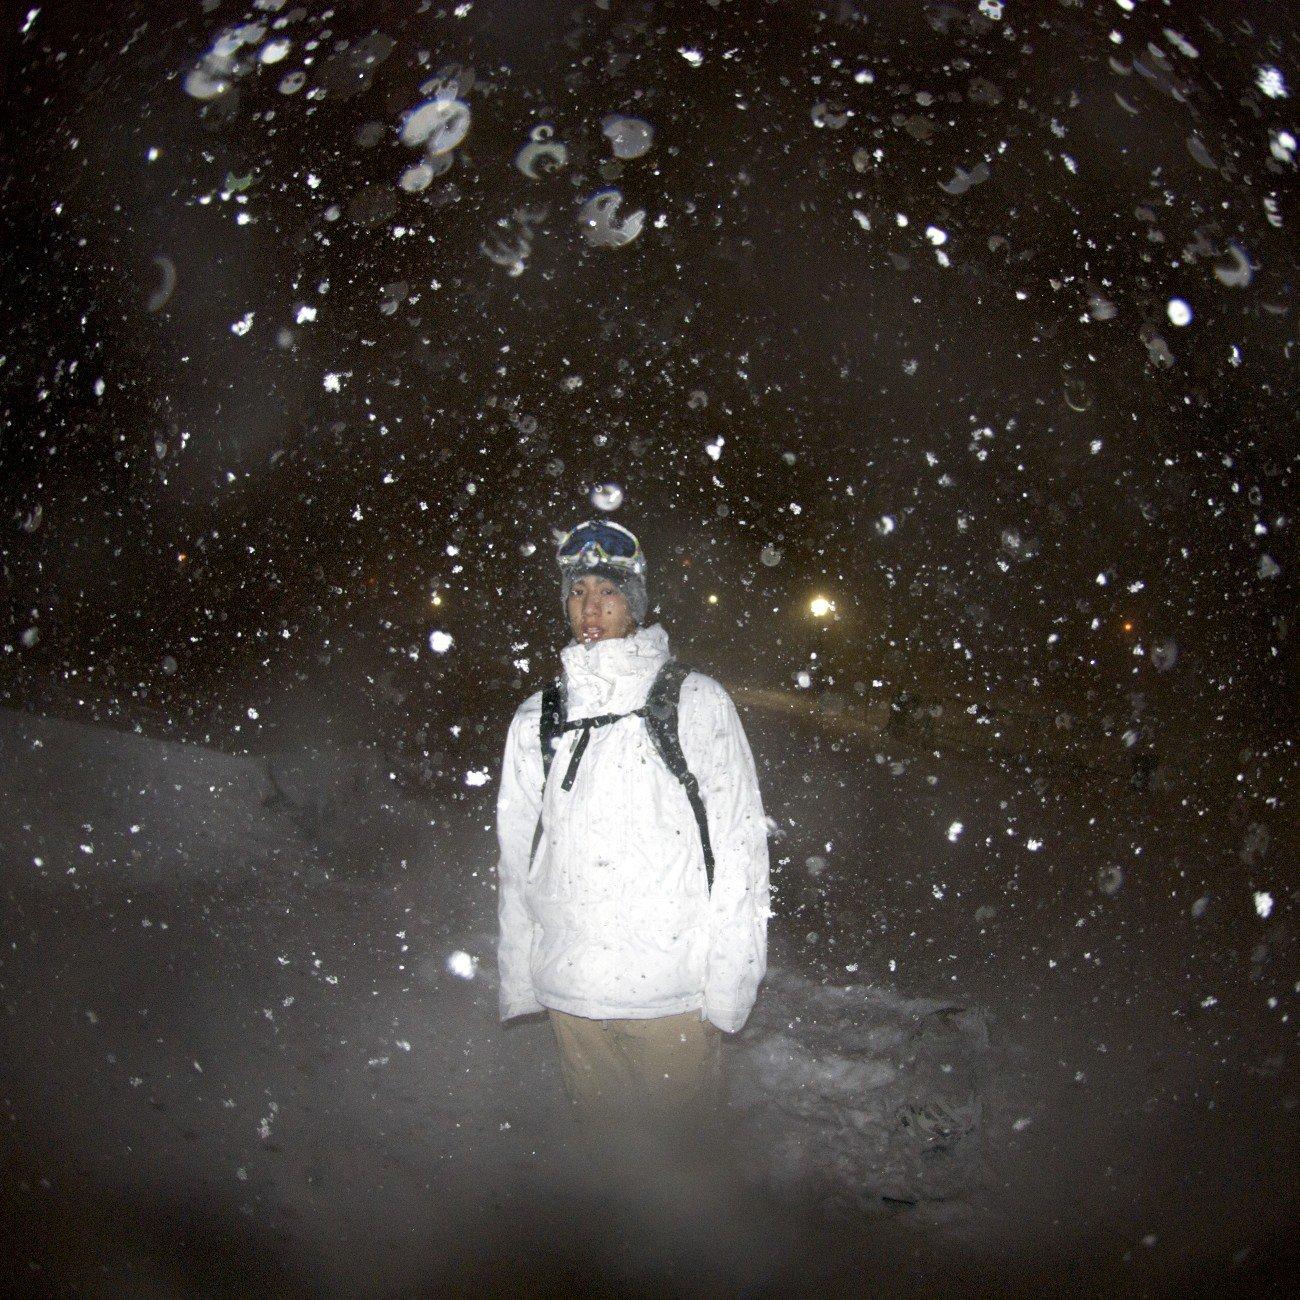 Blizzard in NYC!